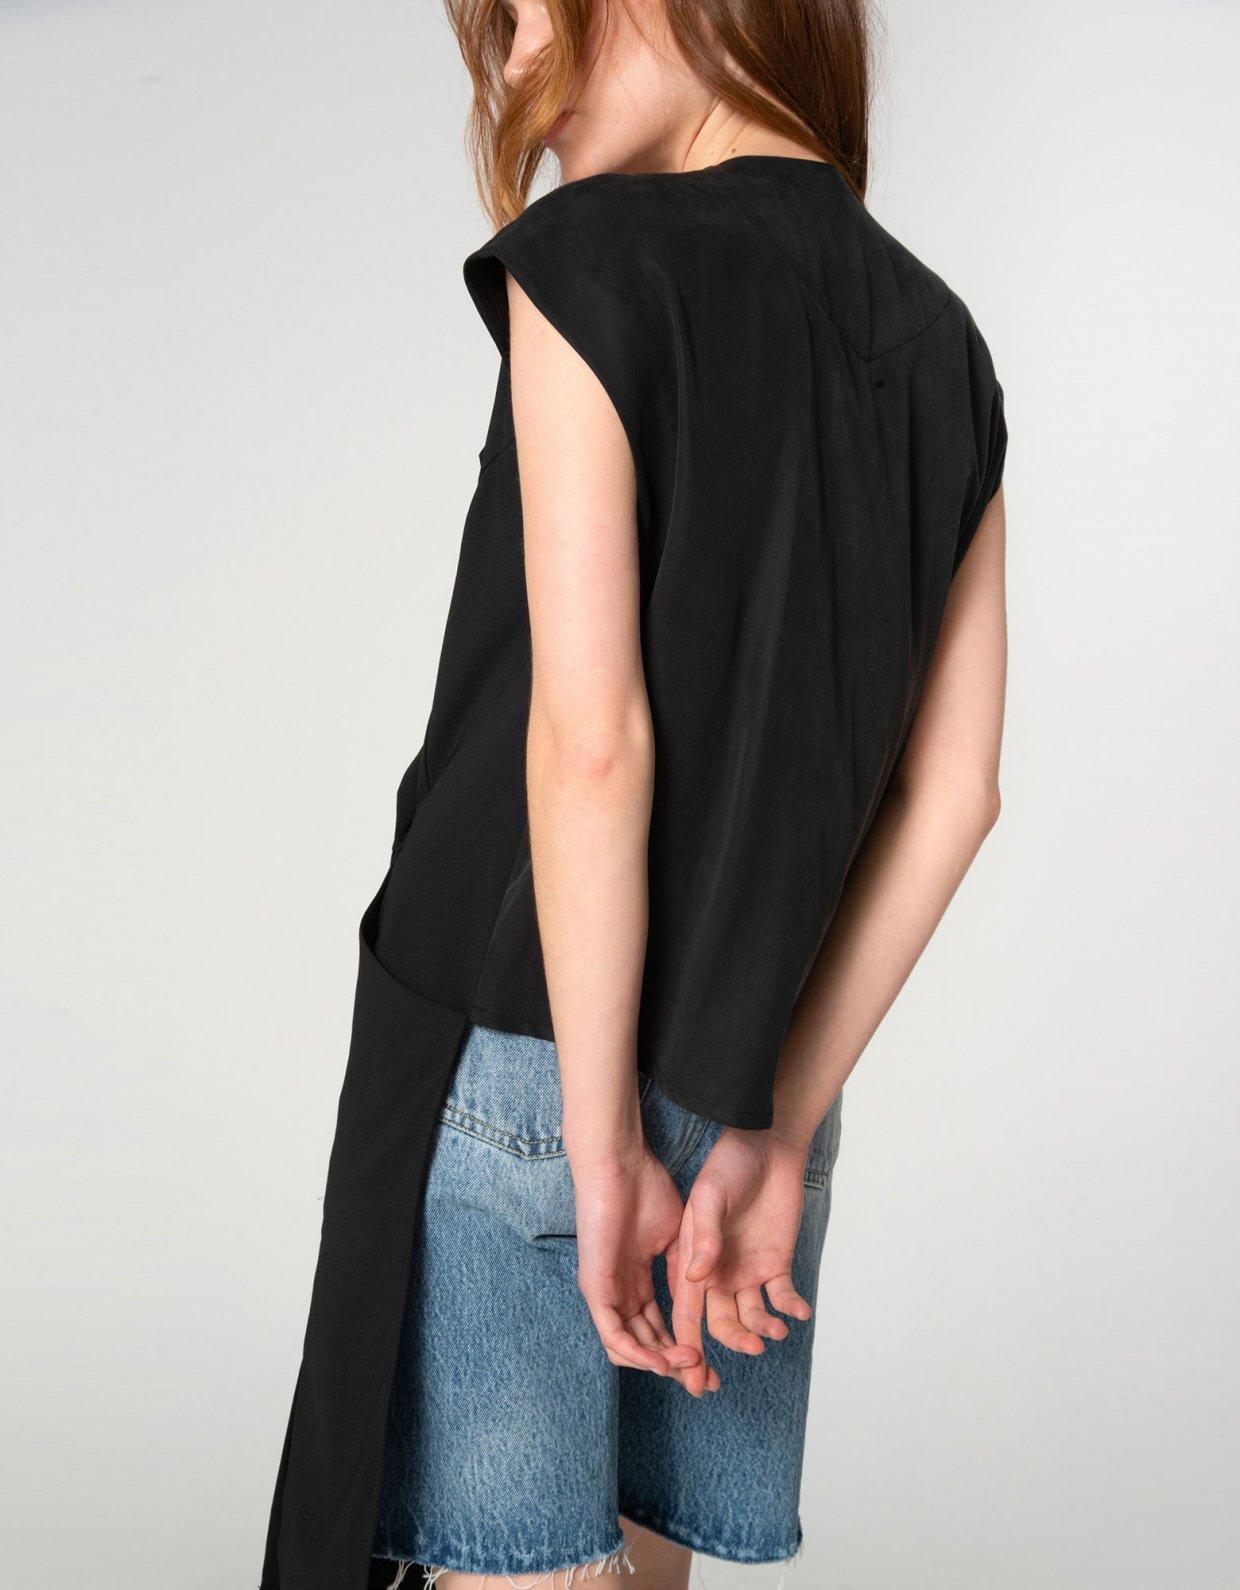 Nadia Rapti Shades of Sahara black vest